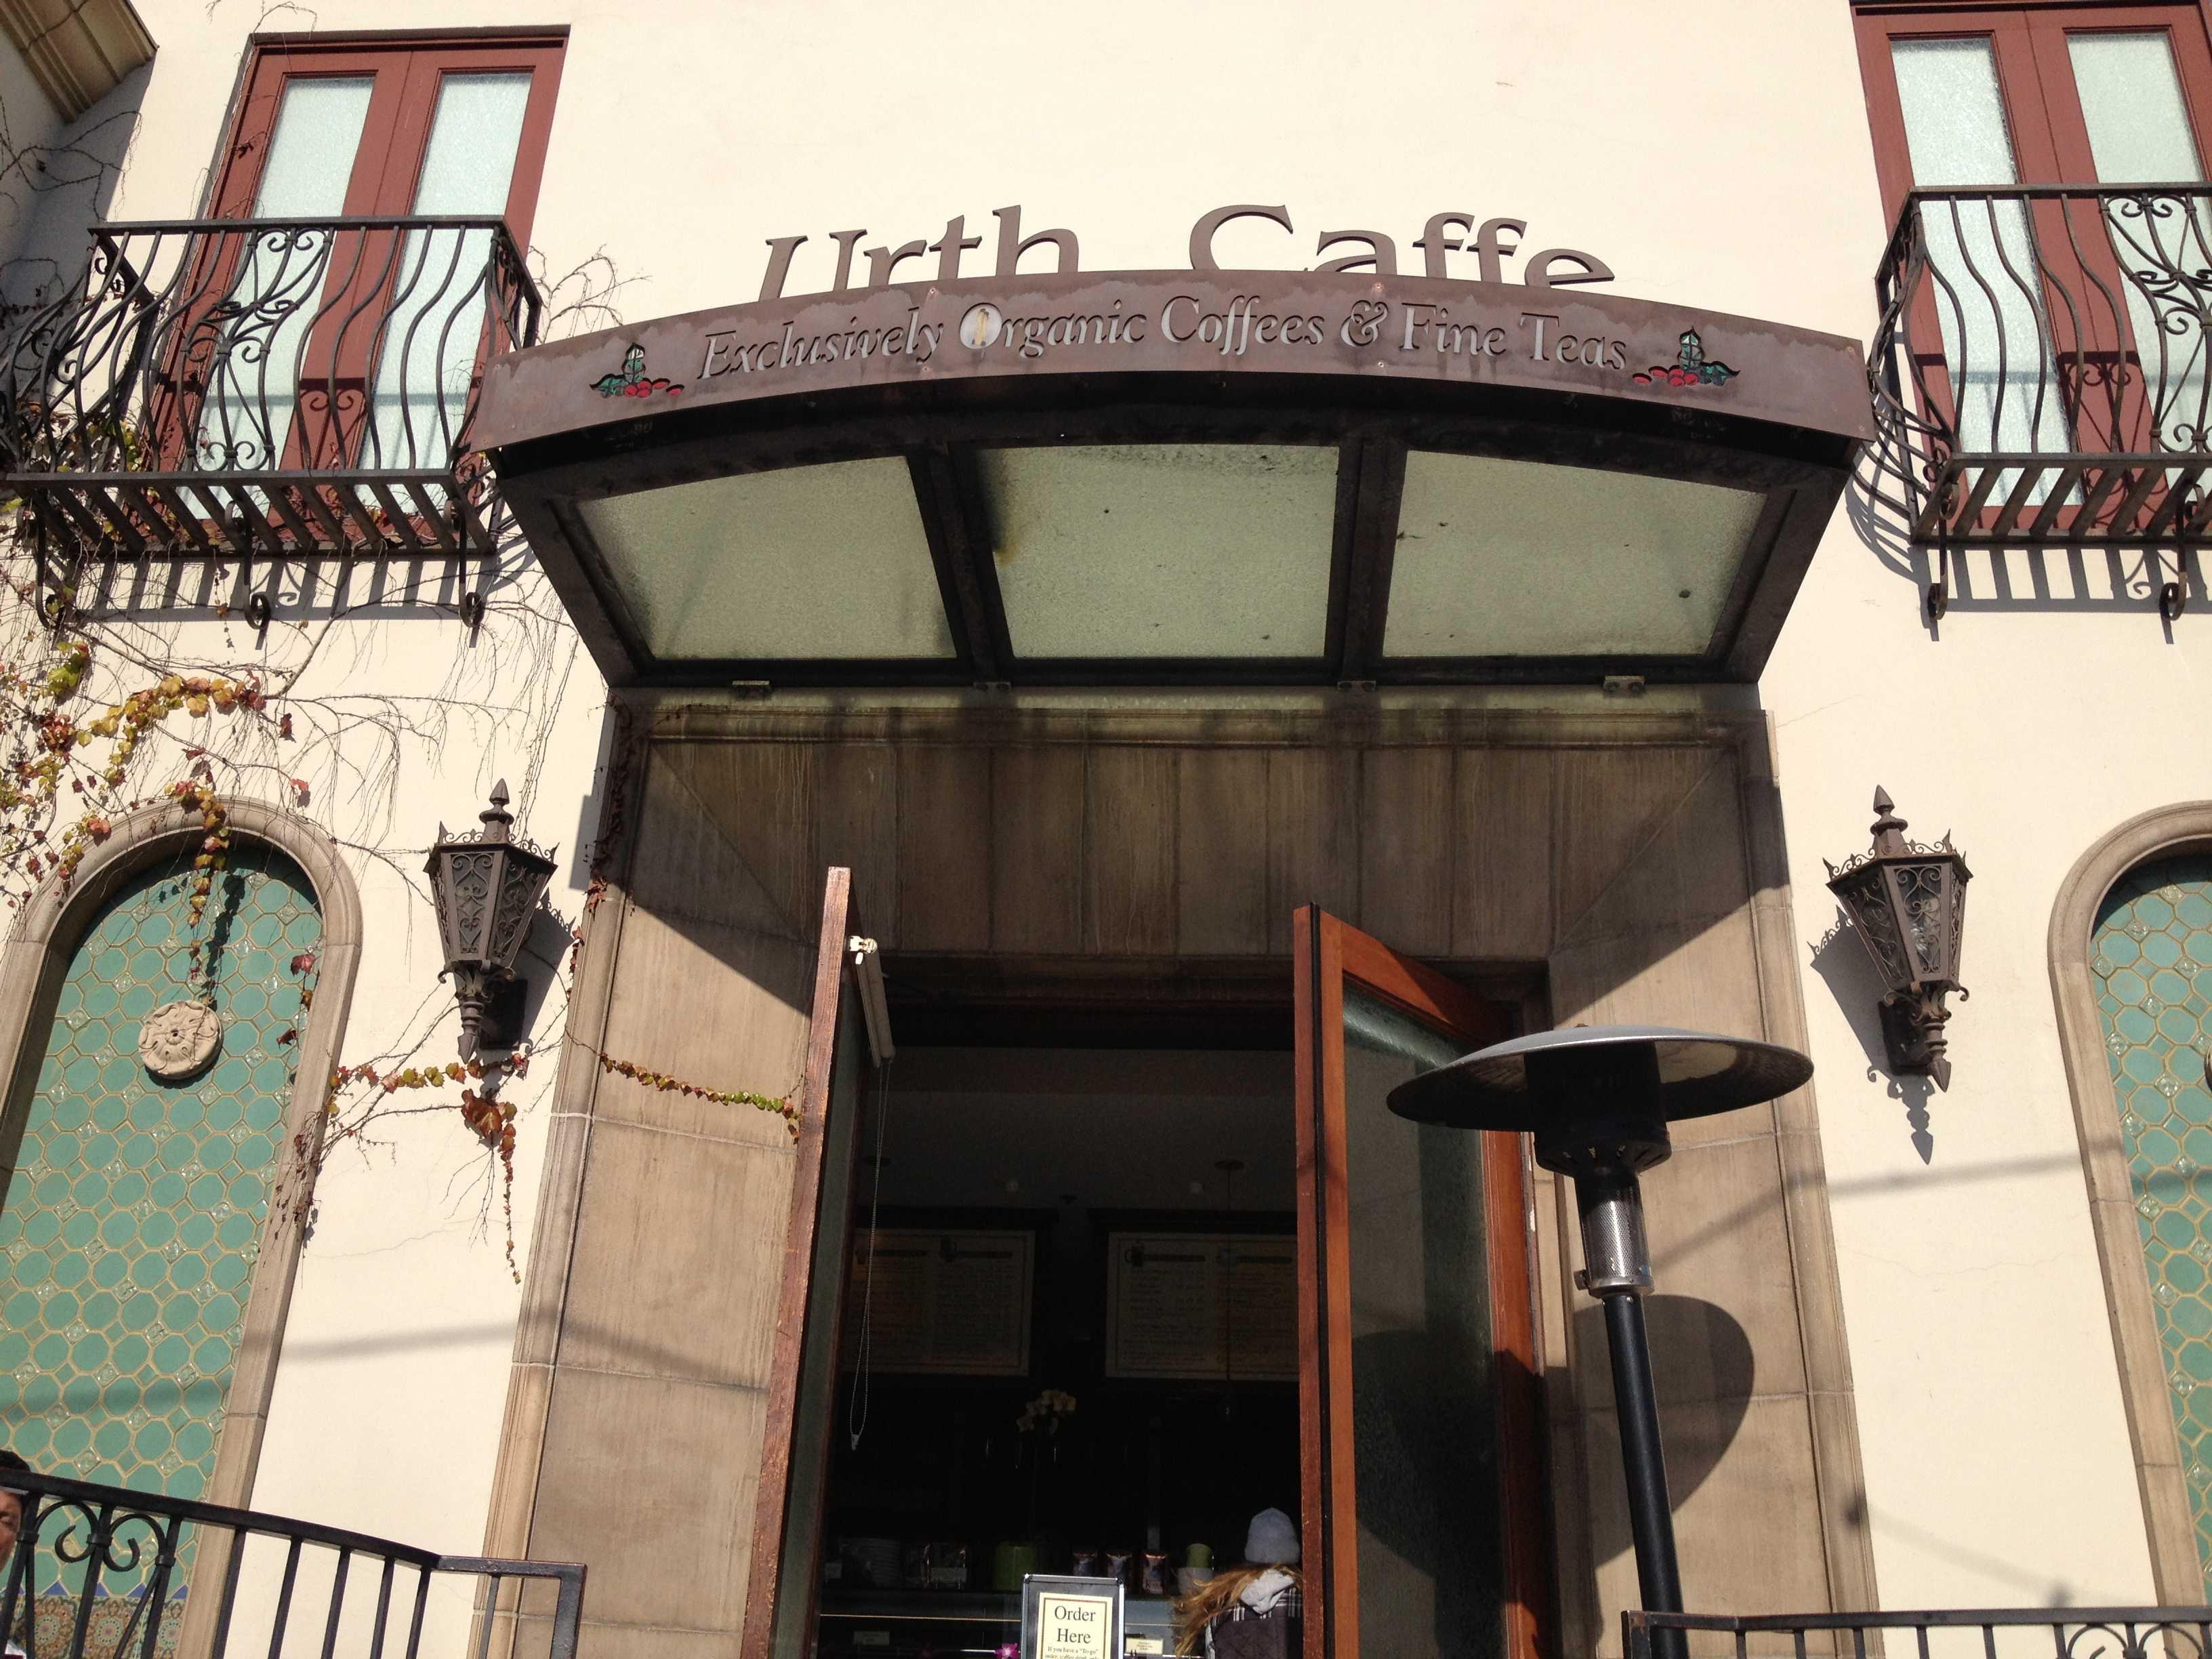 Land at Urth Caffe